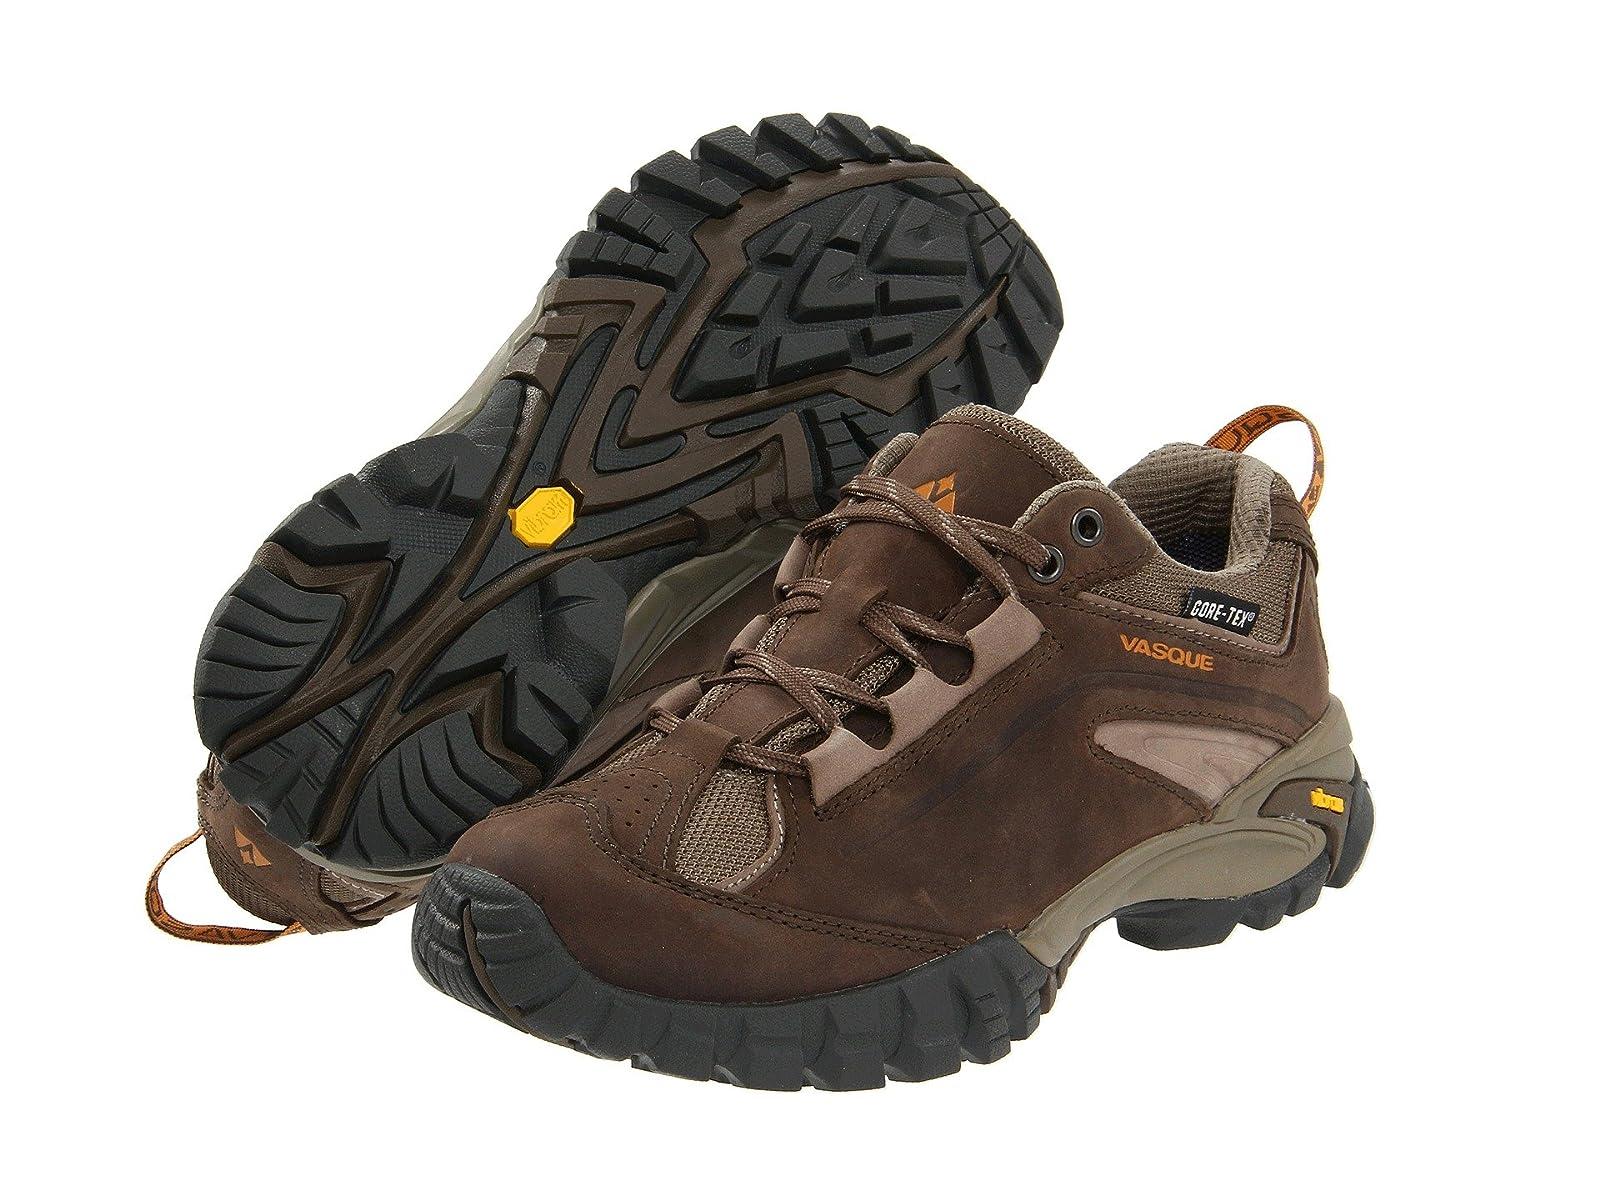 Vasque Mantra 2.0 GTXAtmospheric grades have affordable shoes